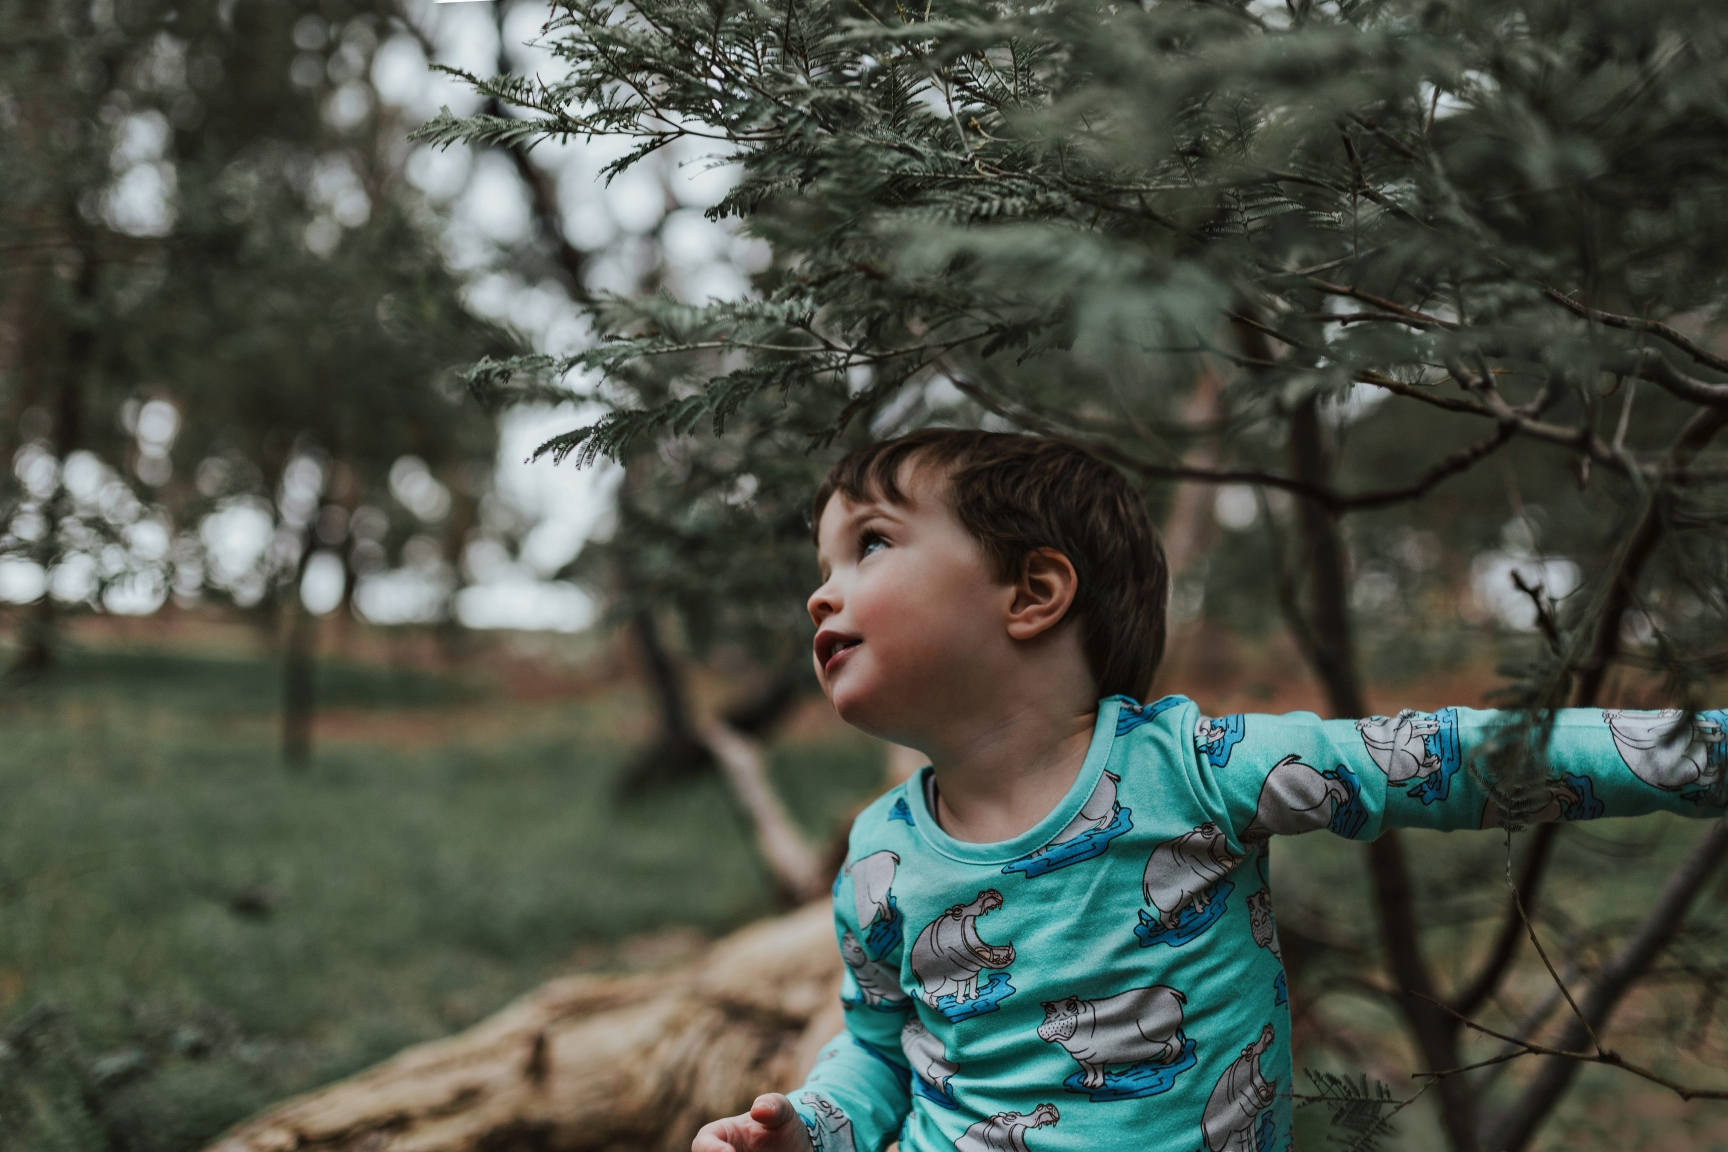 boy-peeking-tree-commercial-photographer-siida-tasmania.jpg